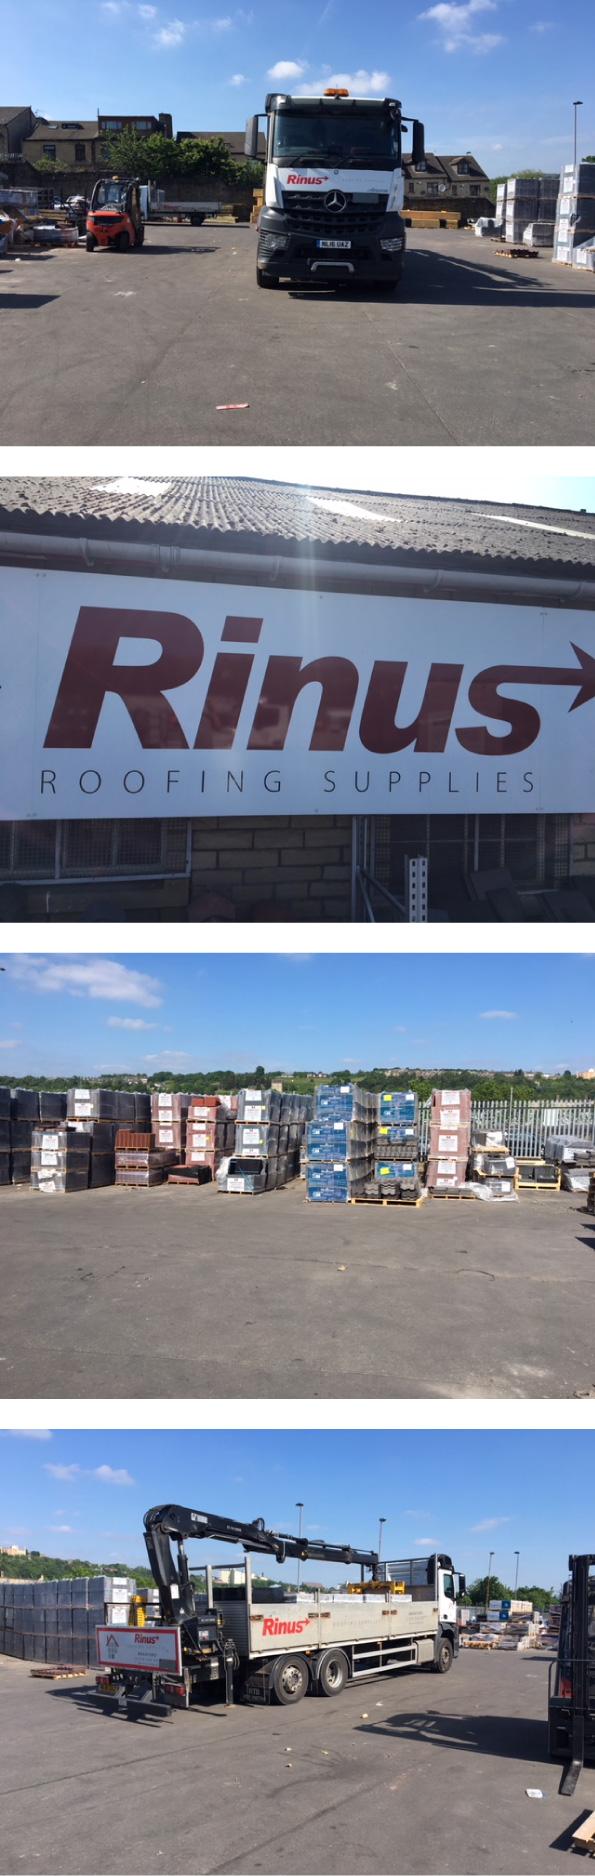 Bradford Roofing Supplier